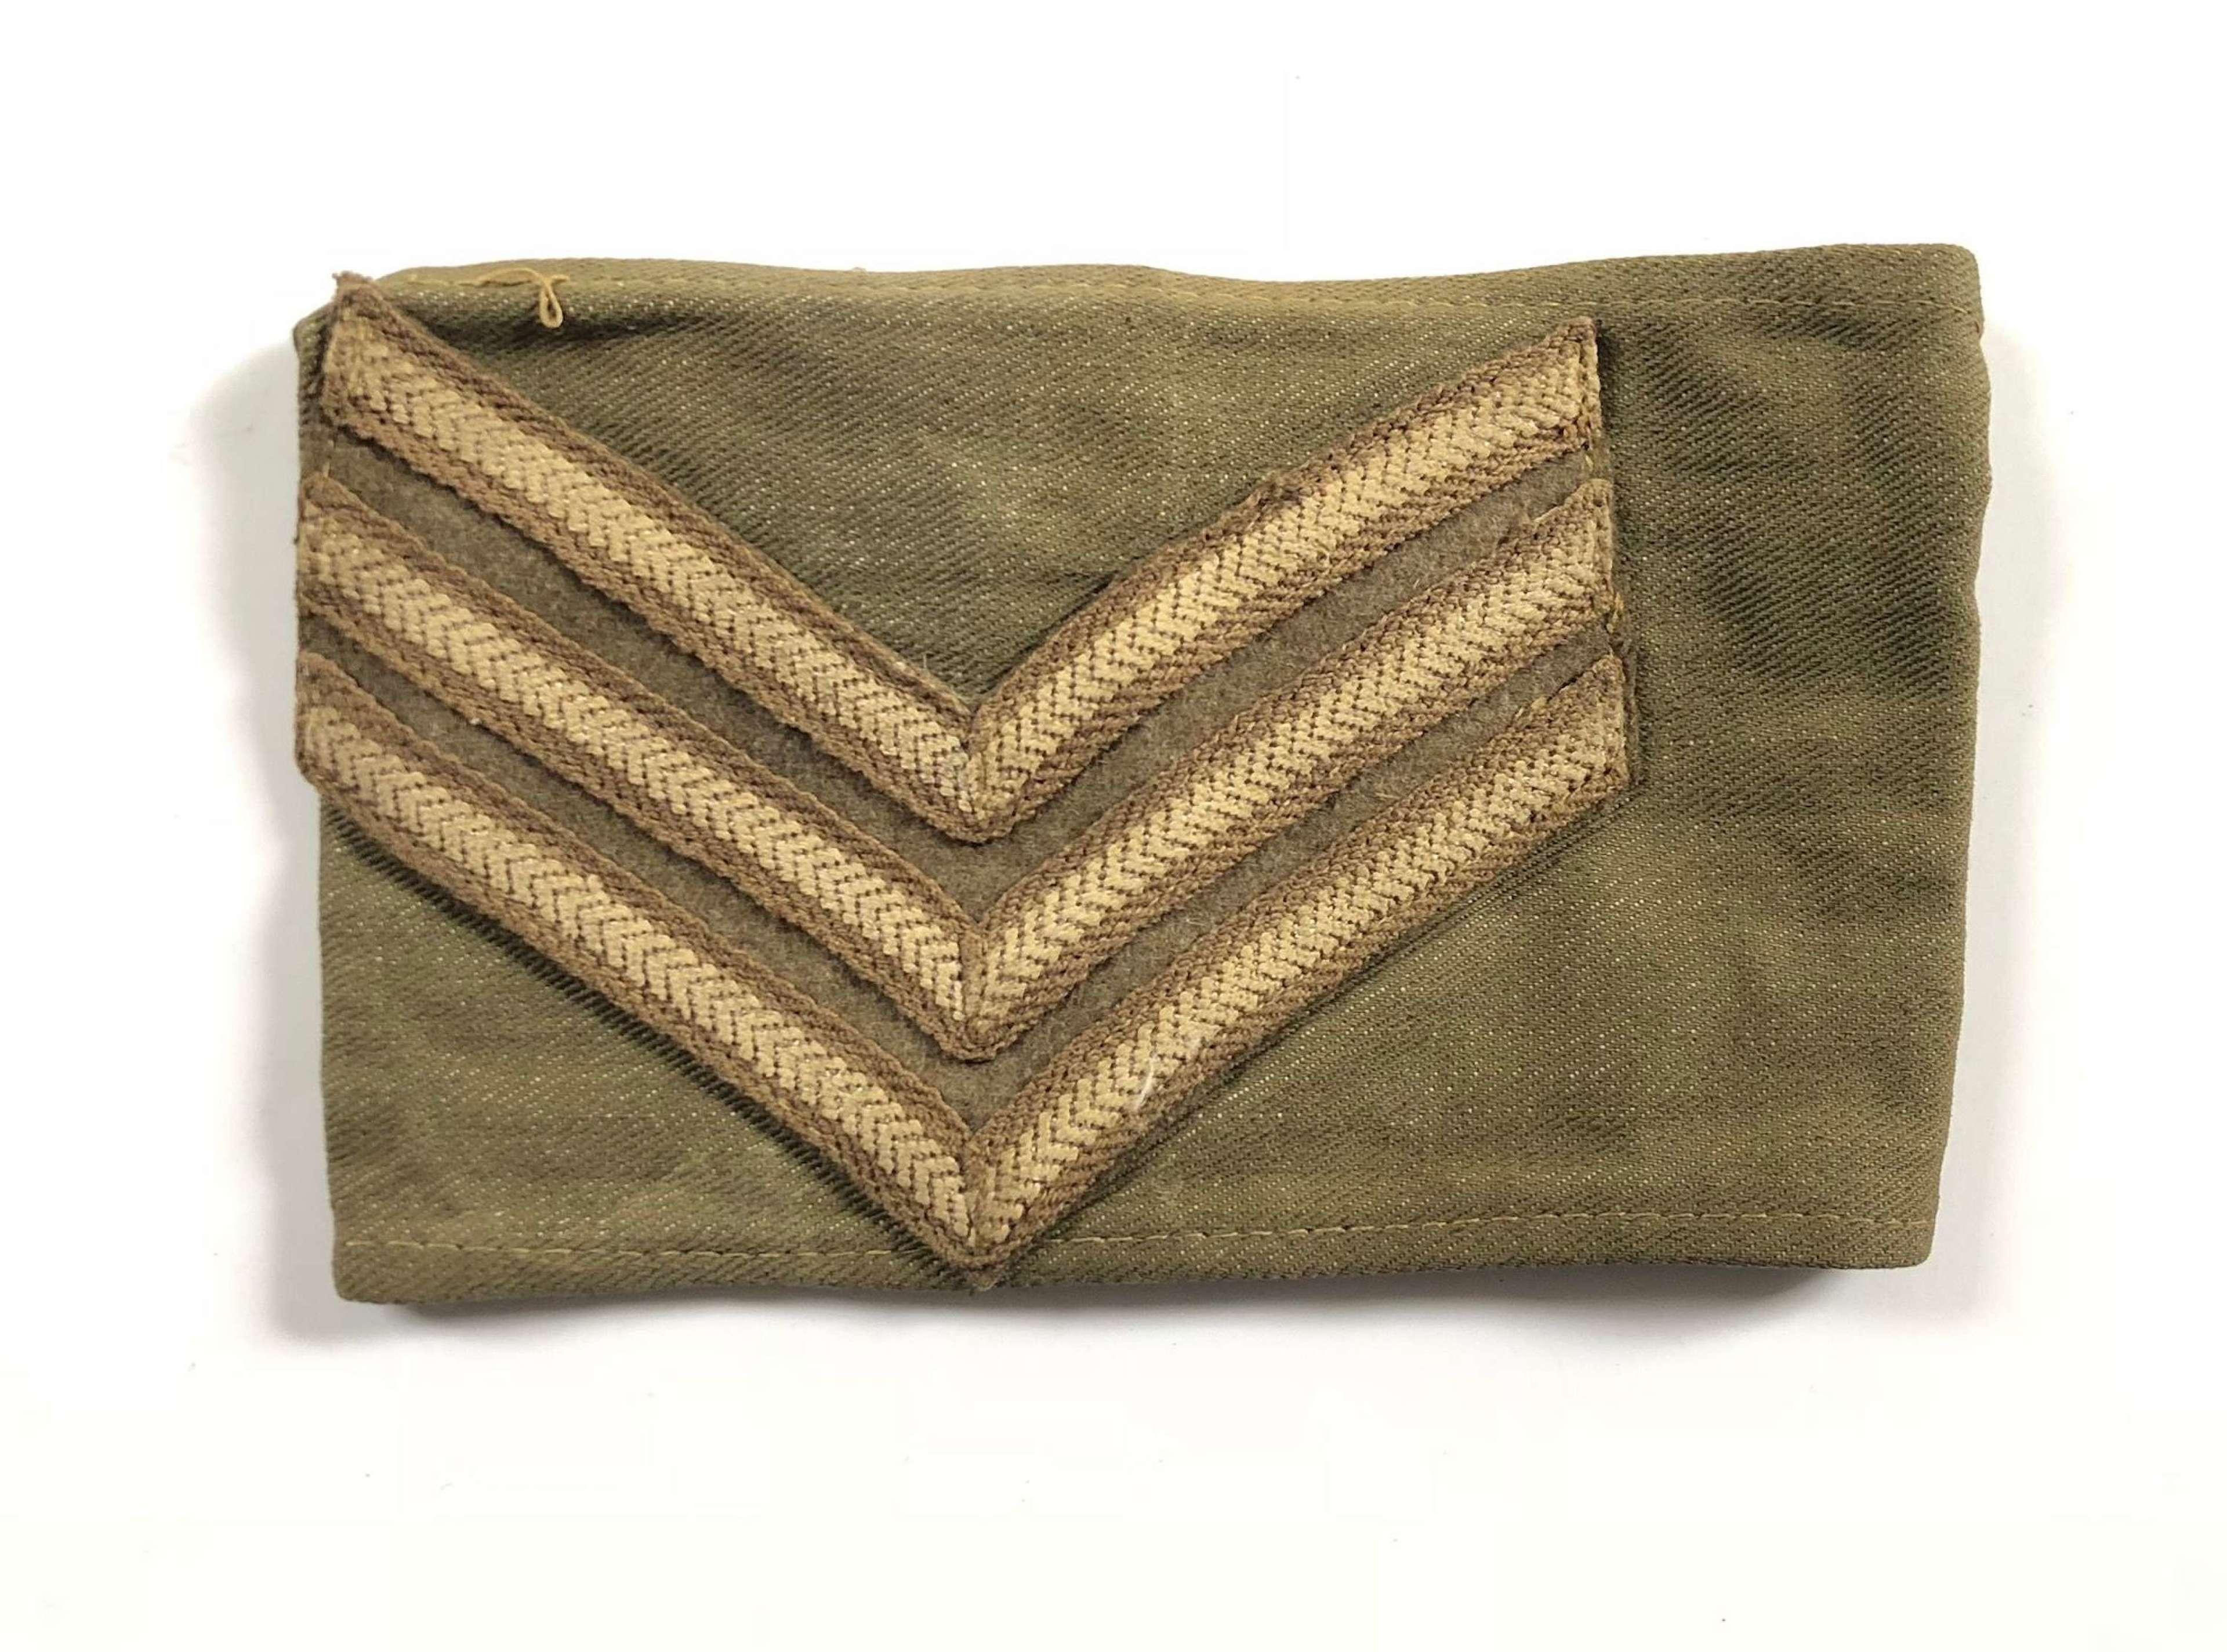 WW2 / Cold War Sergeant Armband.